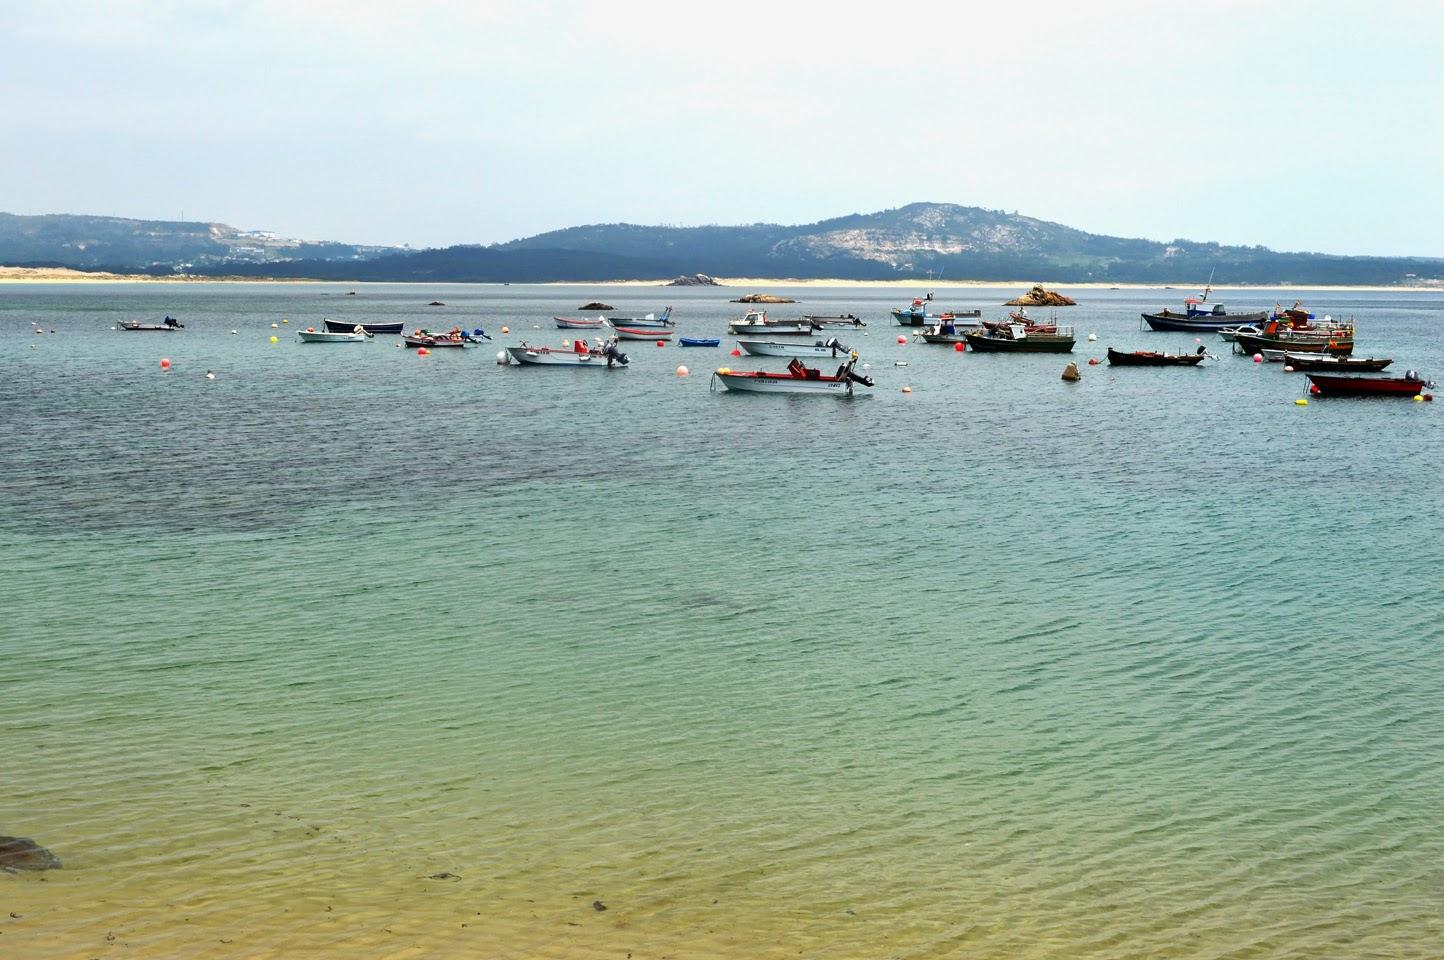 KIDdO Style: The dunes of Galicia